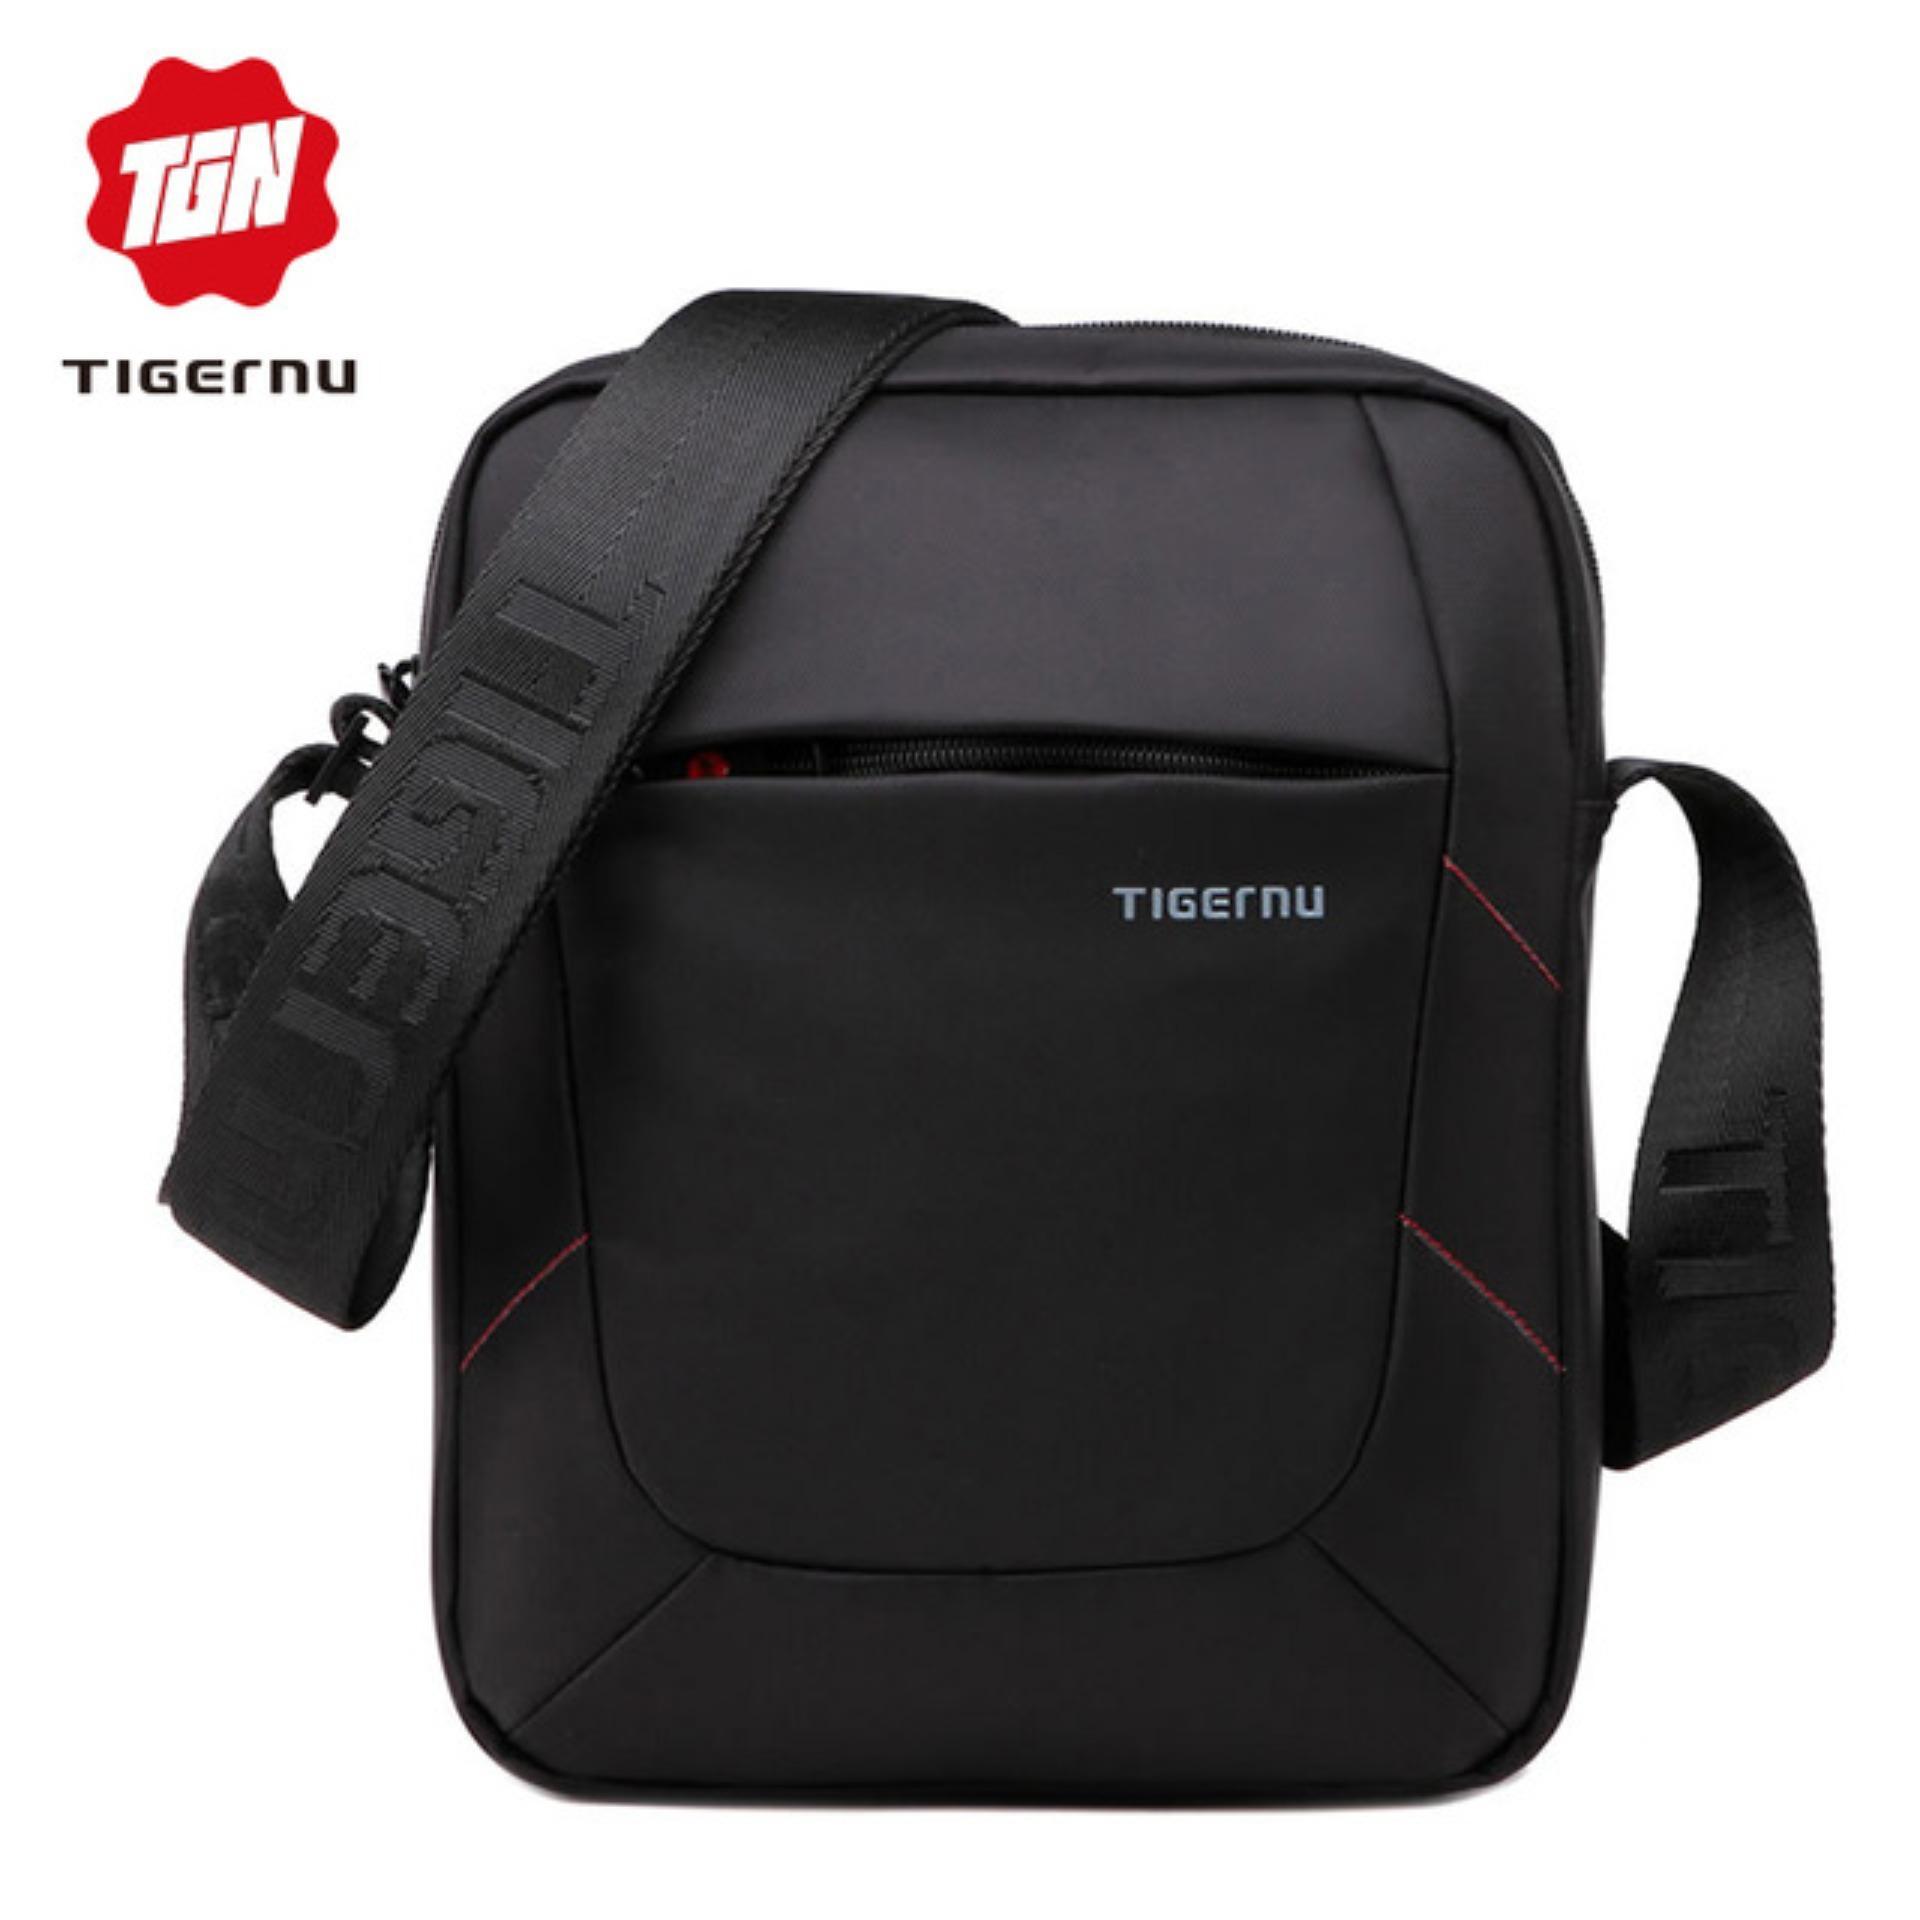 f81afba4f138 11116 items found in Messenger Bags. Tigernu Waterproof Men s Casual  Business Shoulder Messenger Bag for Phone Wallet 5108 - intl